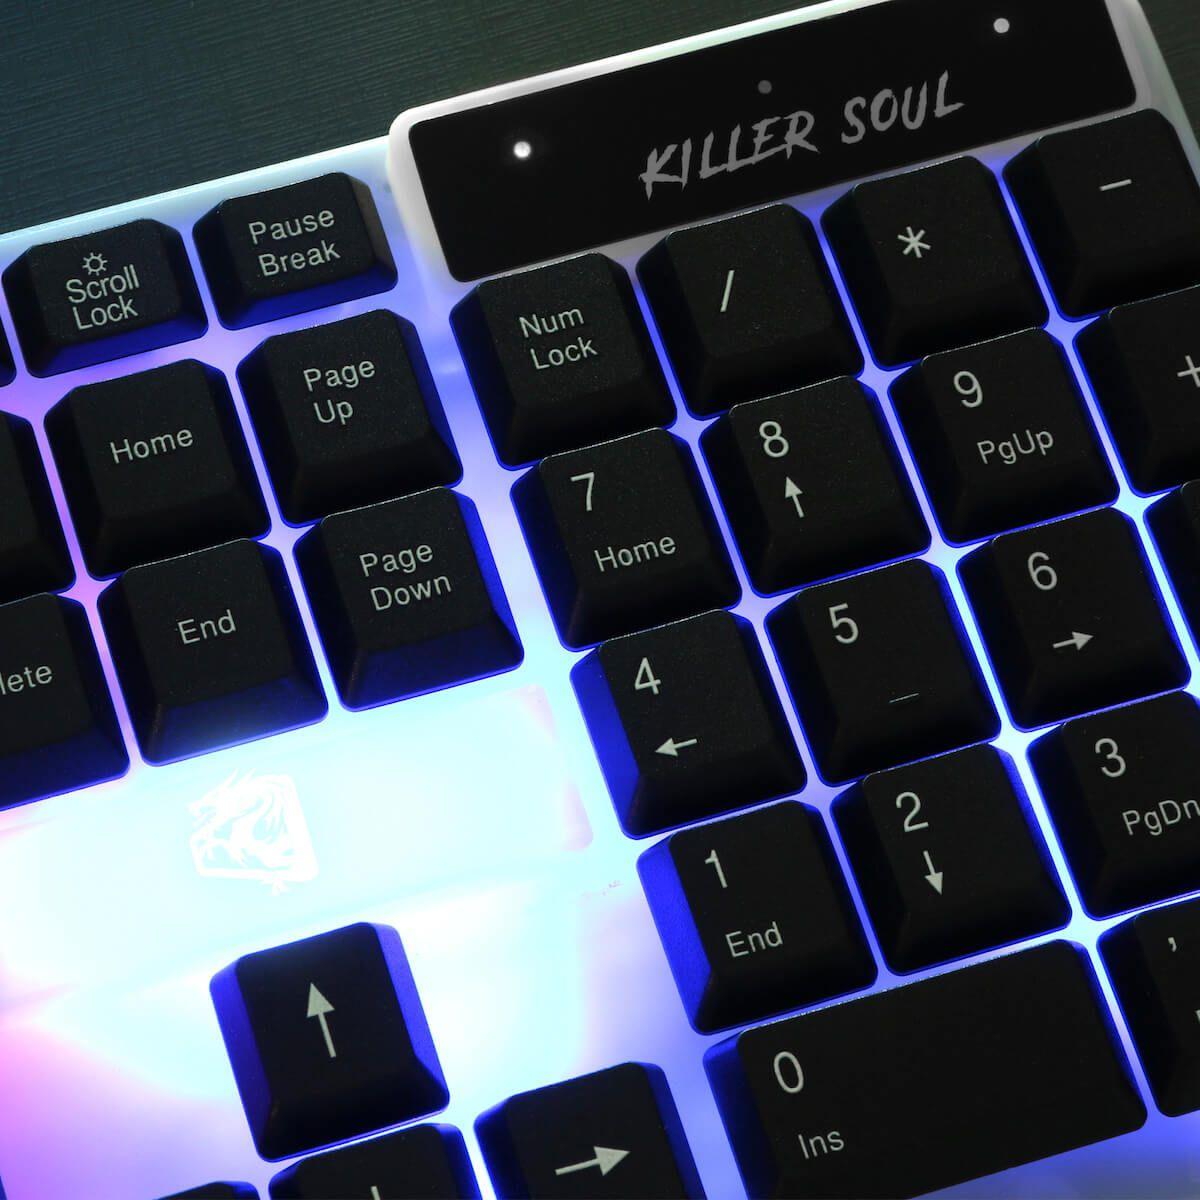 Teclado Gamer Membrana Tripla 114 Teclas iluminado Killer Soul TGKS ELG  - Central Suportes